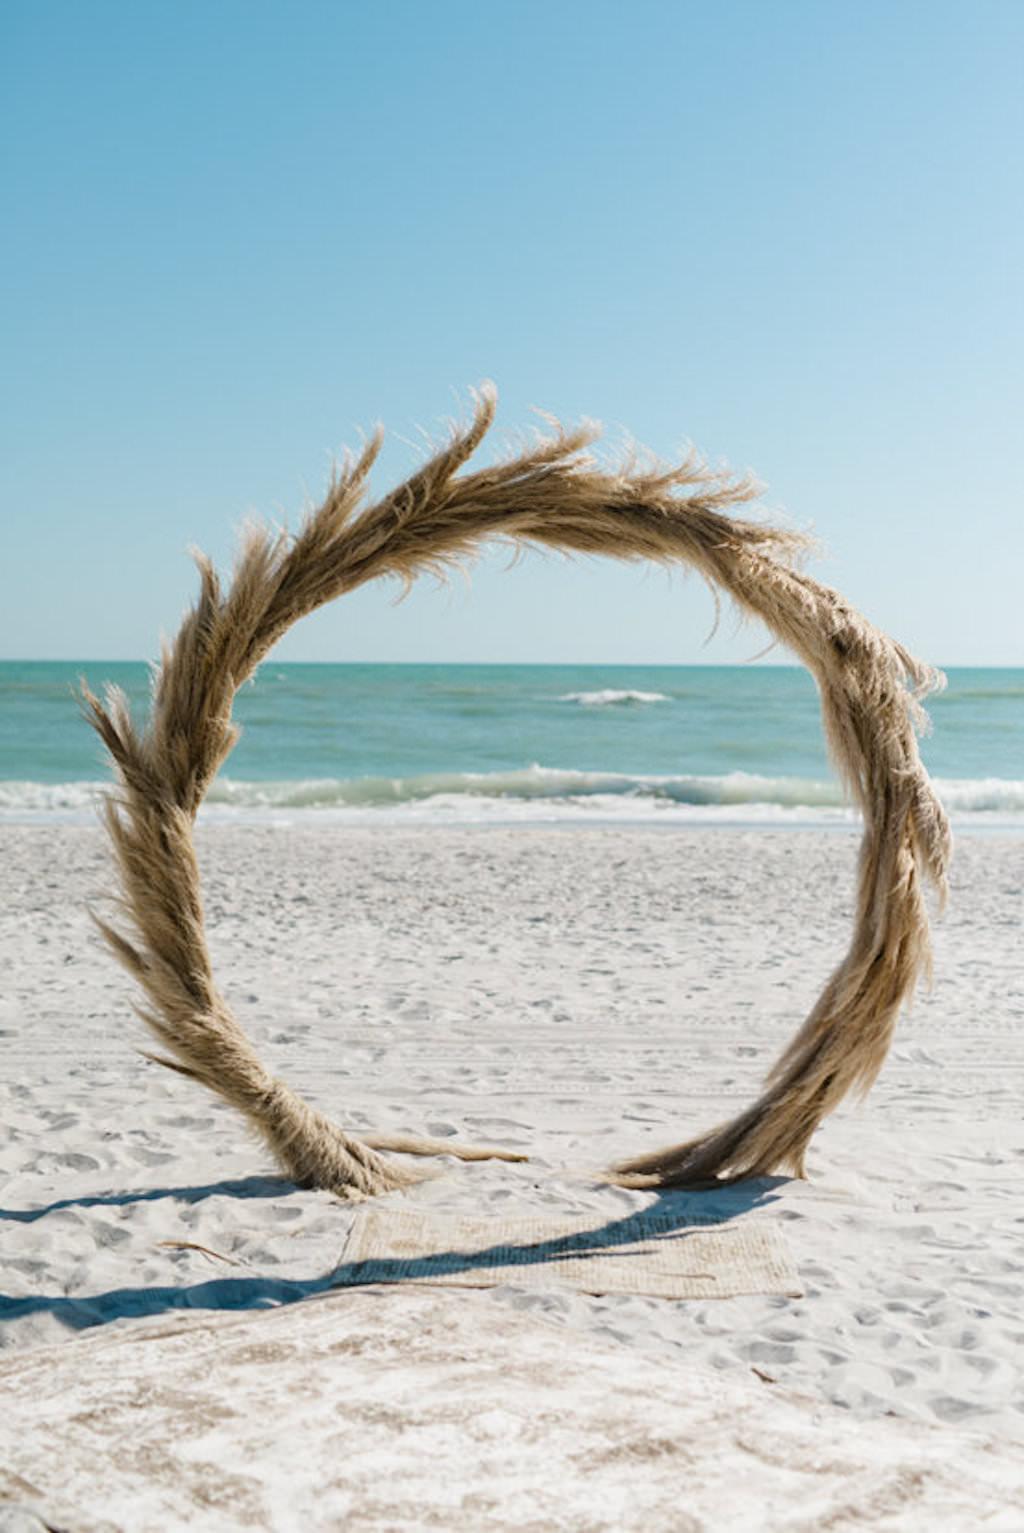 Longboat Key Club Beachfront Wedding Ceremony with Beach Grass Wedding Ceremony Arch | Resort at Longboat Key Club Waterfront Beach Wedding Venue